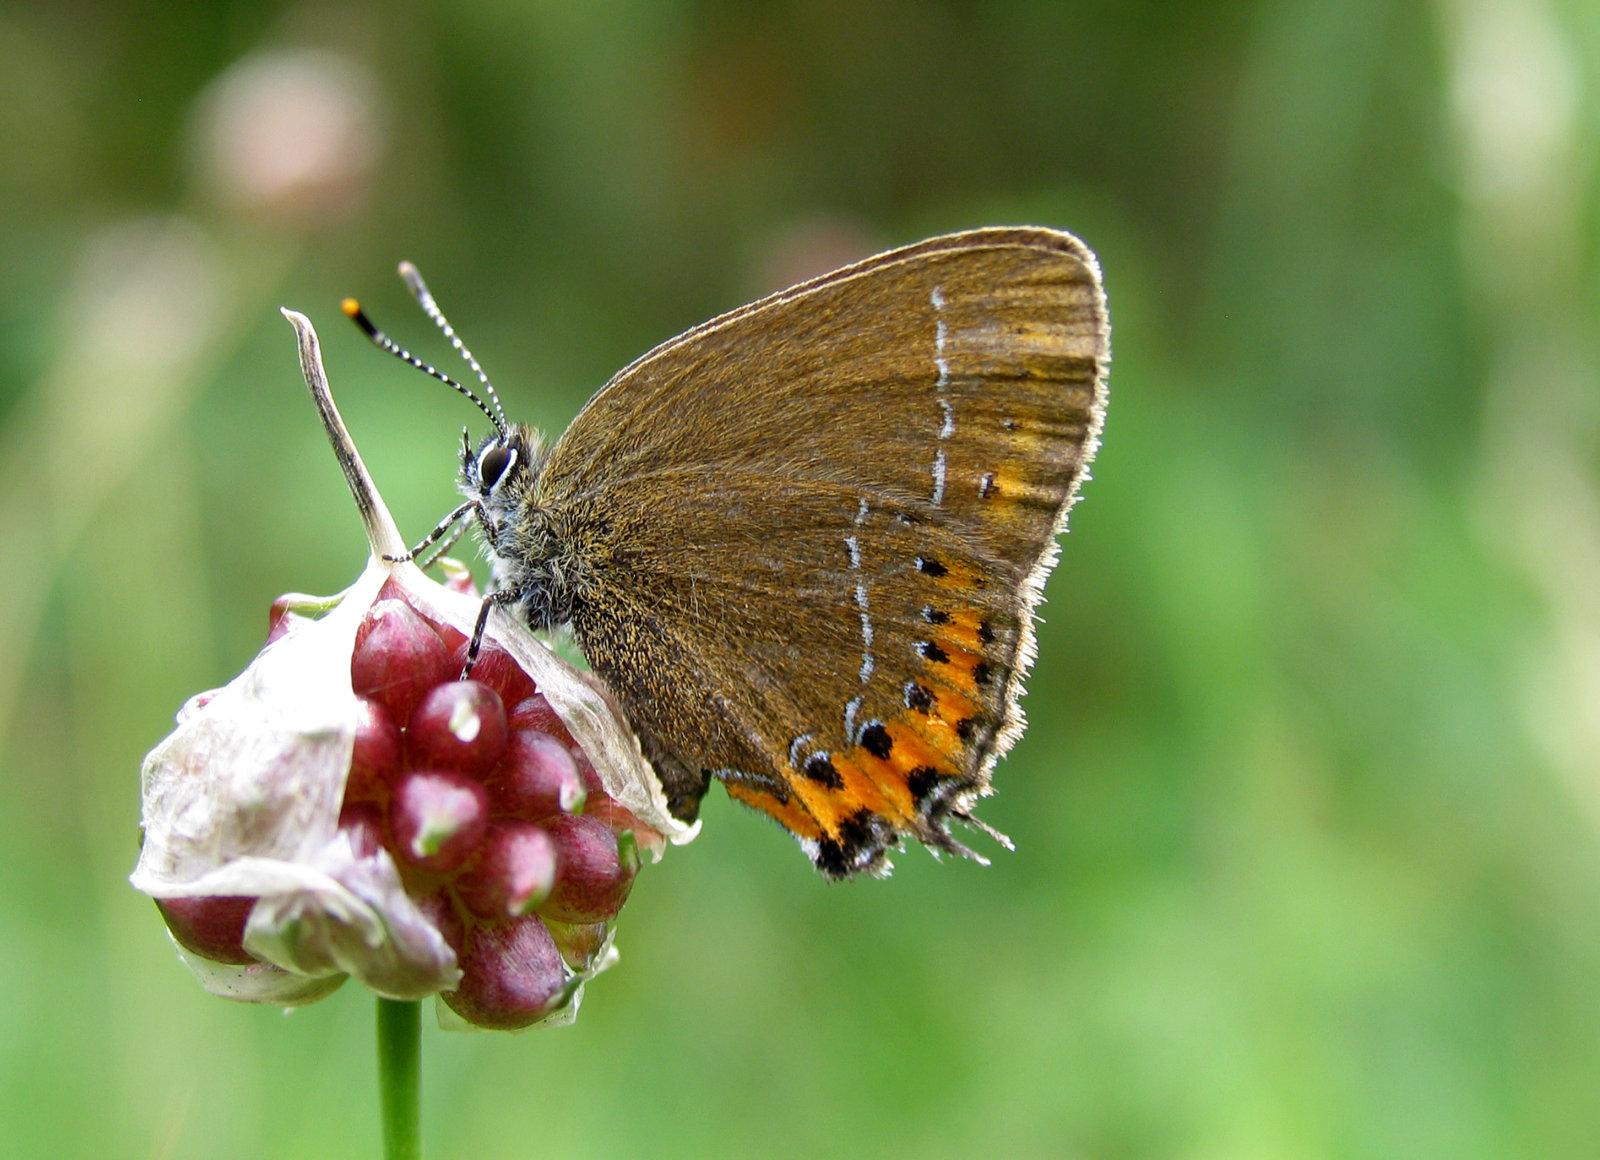 Slåensommerfugl, Satyrium pruni